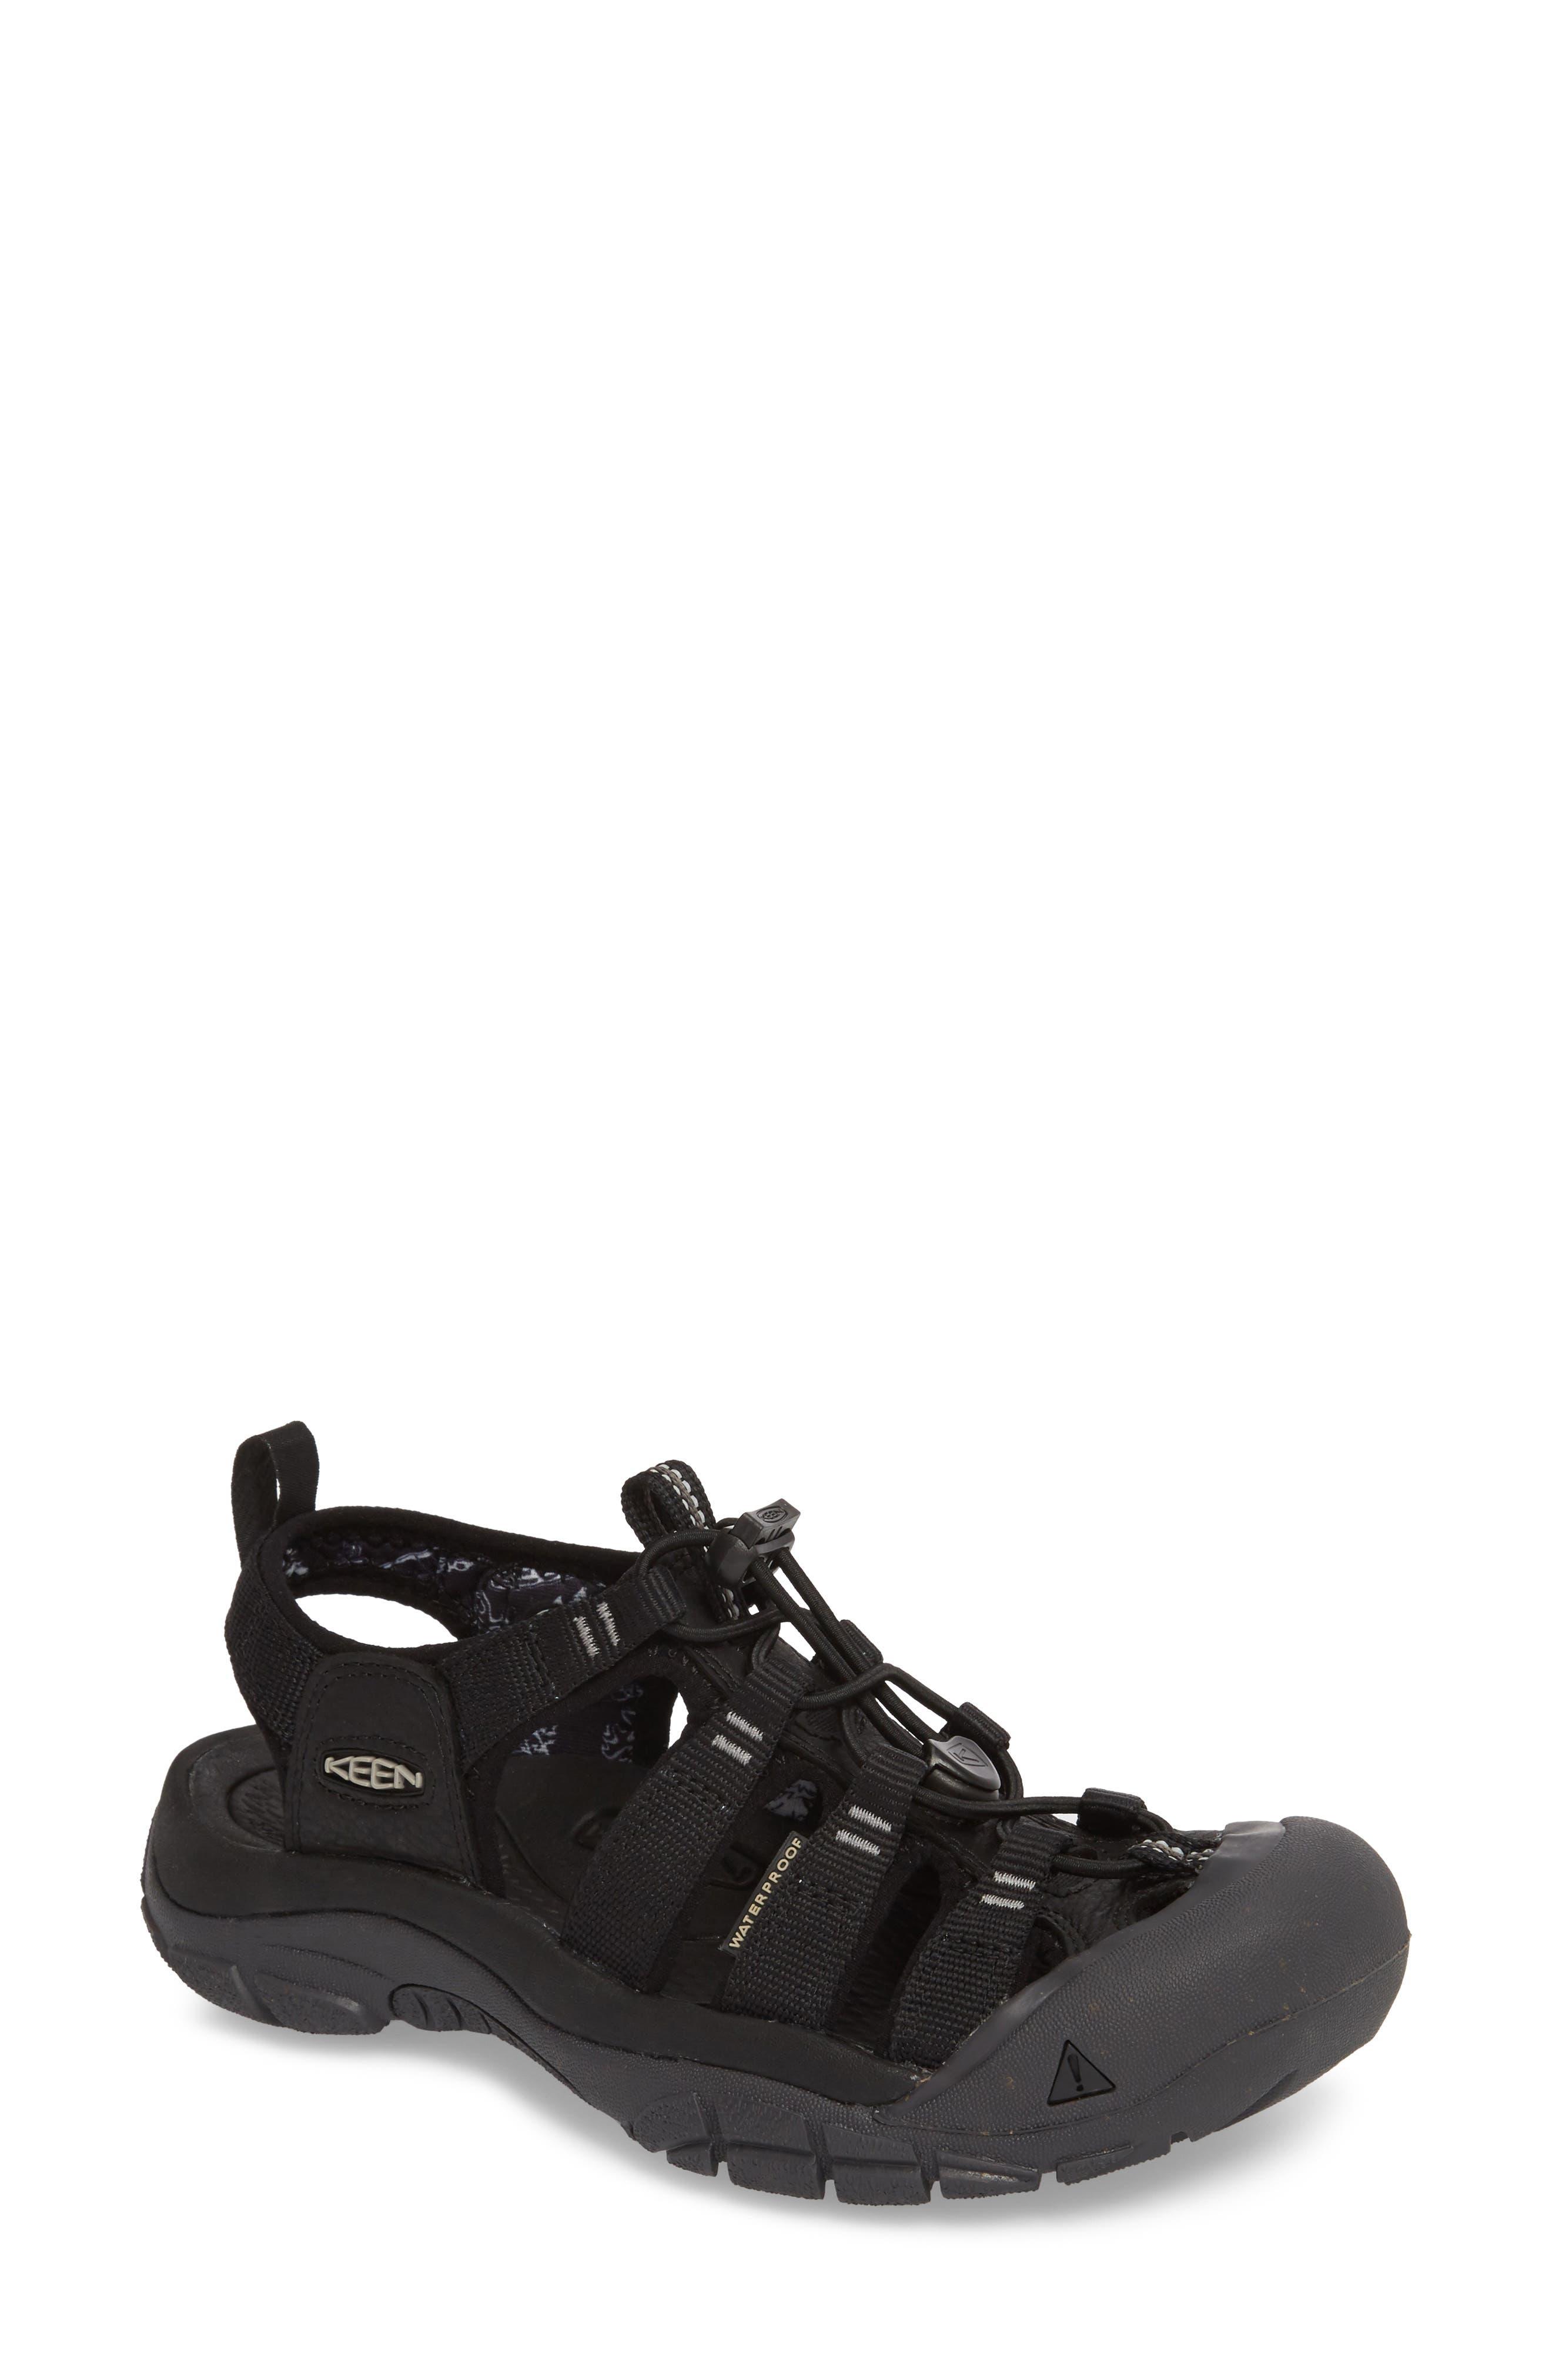 Newport Eco Waterproof Sandal,                             Main thumbnail 1, color,                             Black/ Magnet